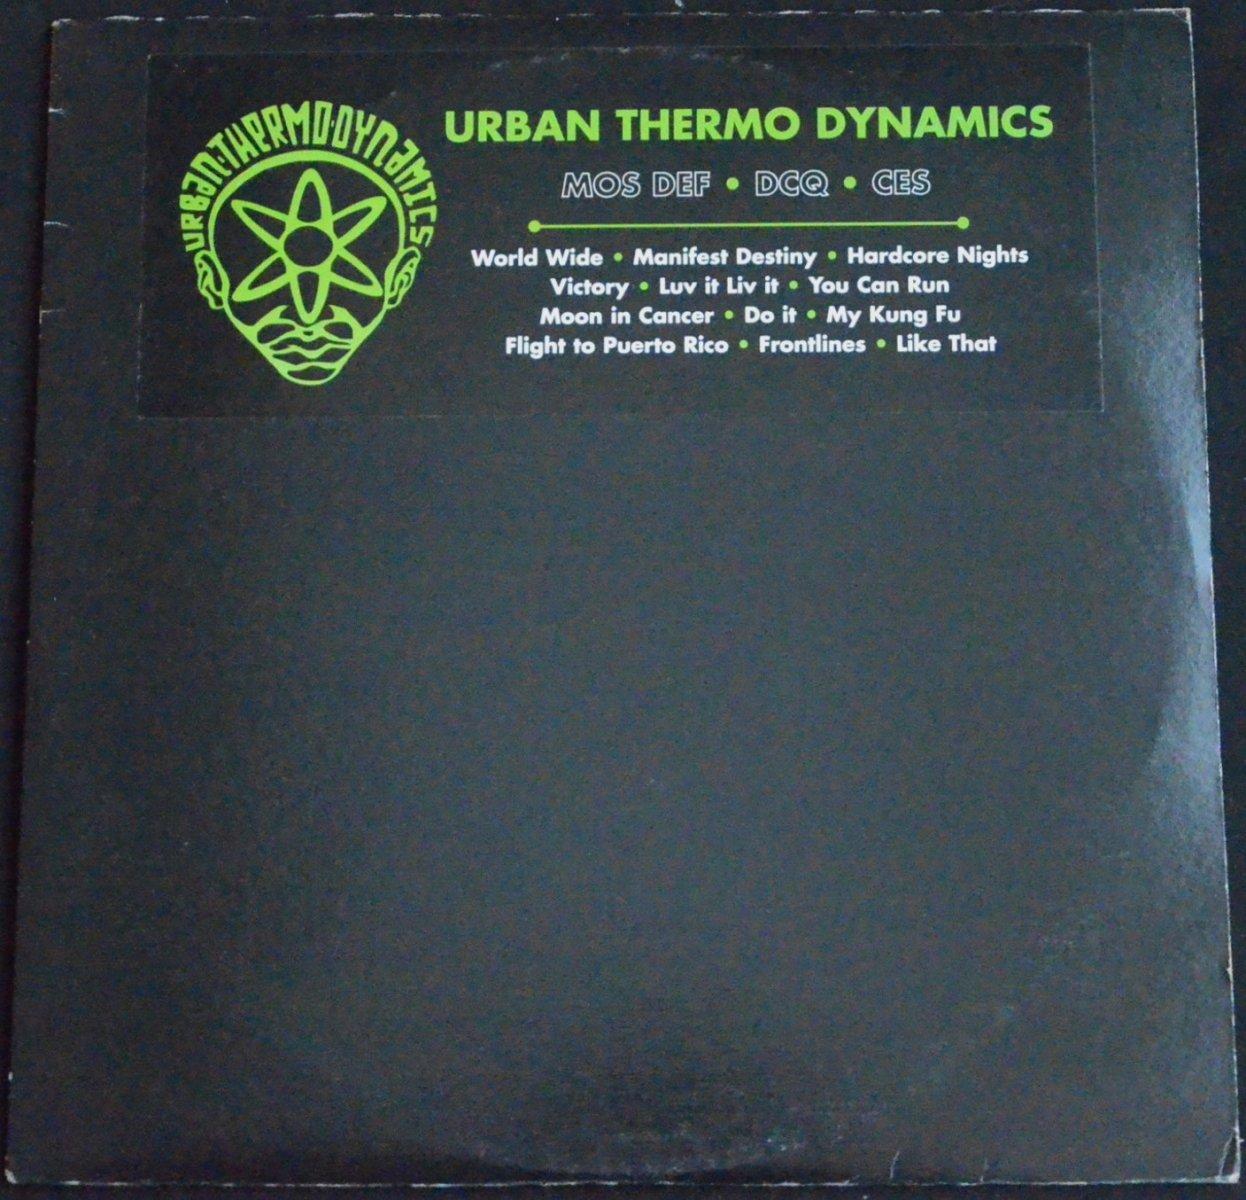 U.T.D. (URBAN THERMO DYNAMICS) / URBAN THERMO DYNAMICS (MOS DEF,DCQ,CES) (2LP)